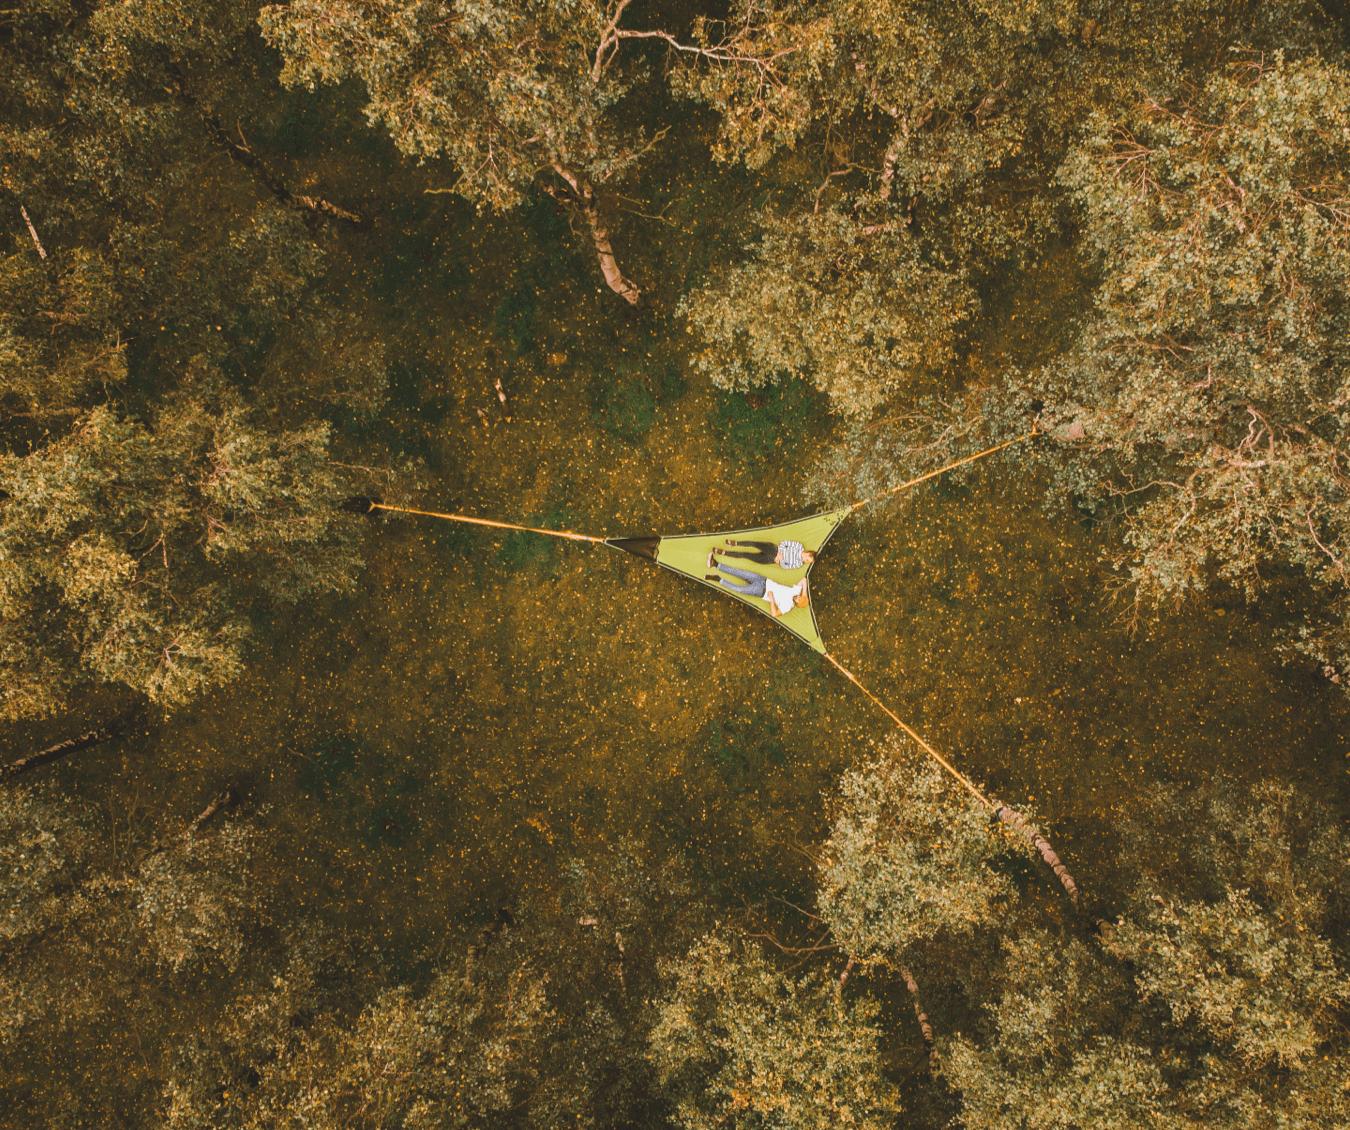 Hammock from above